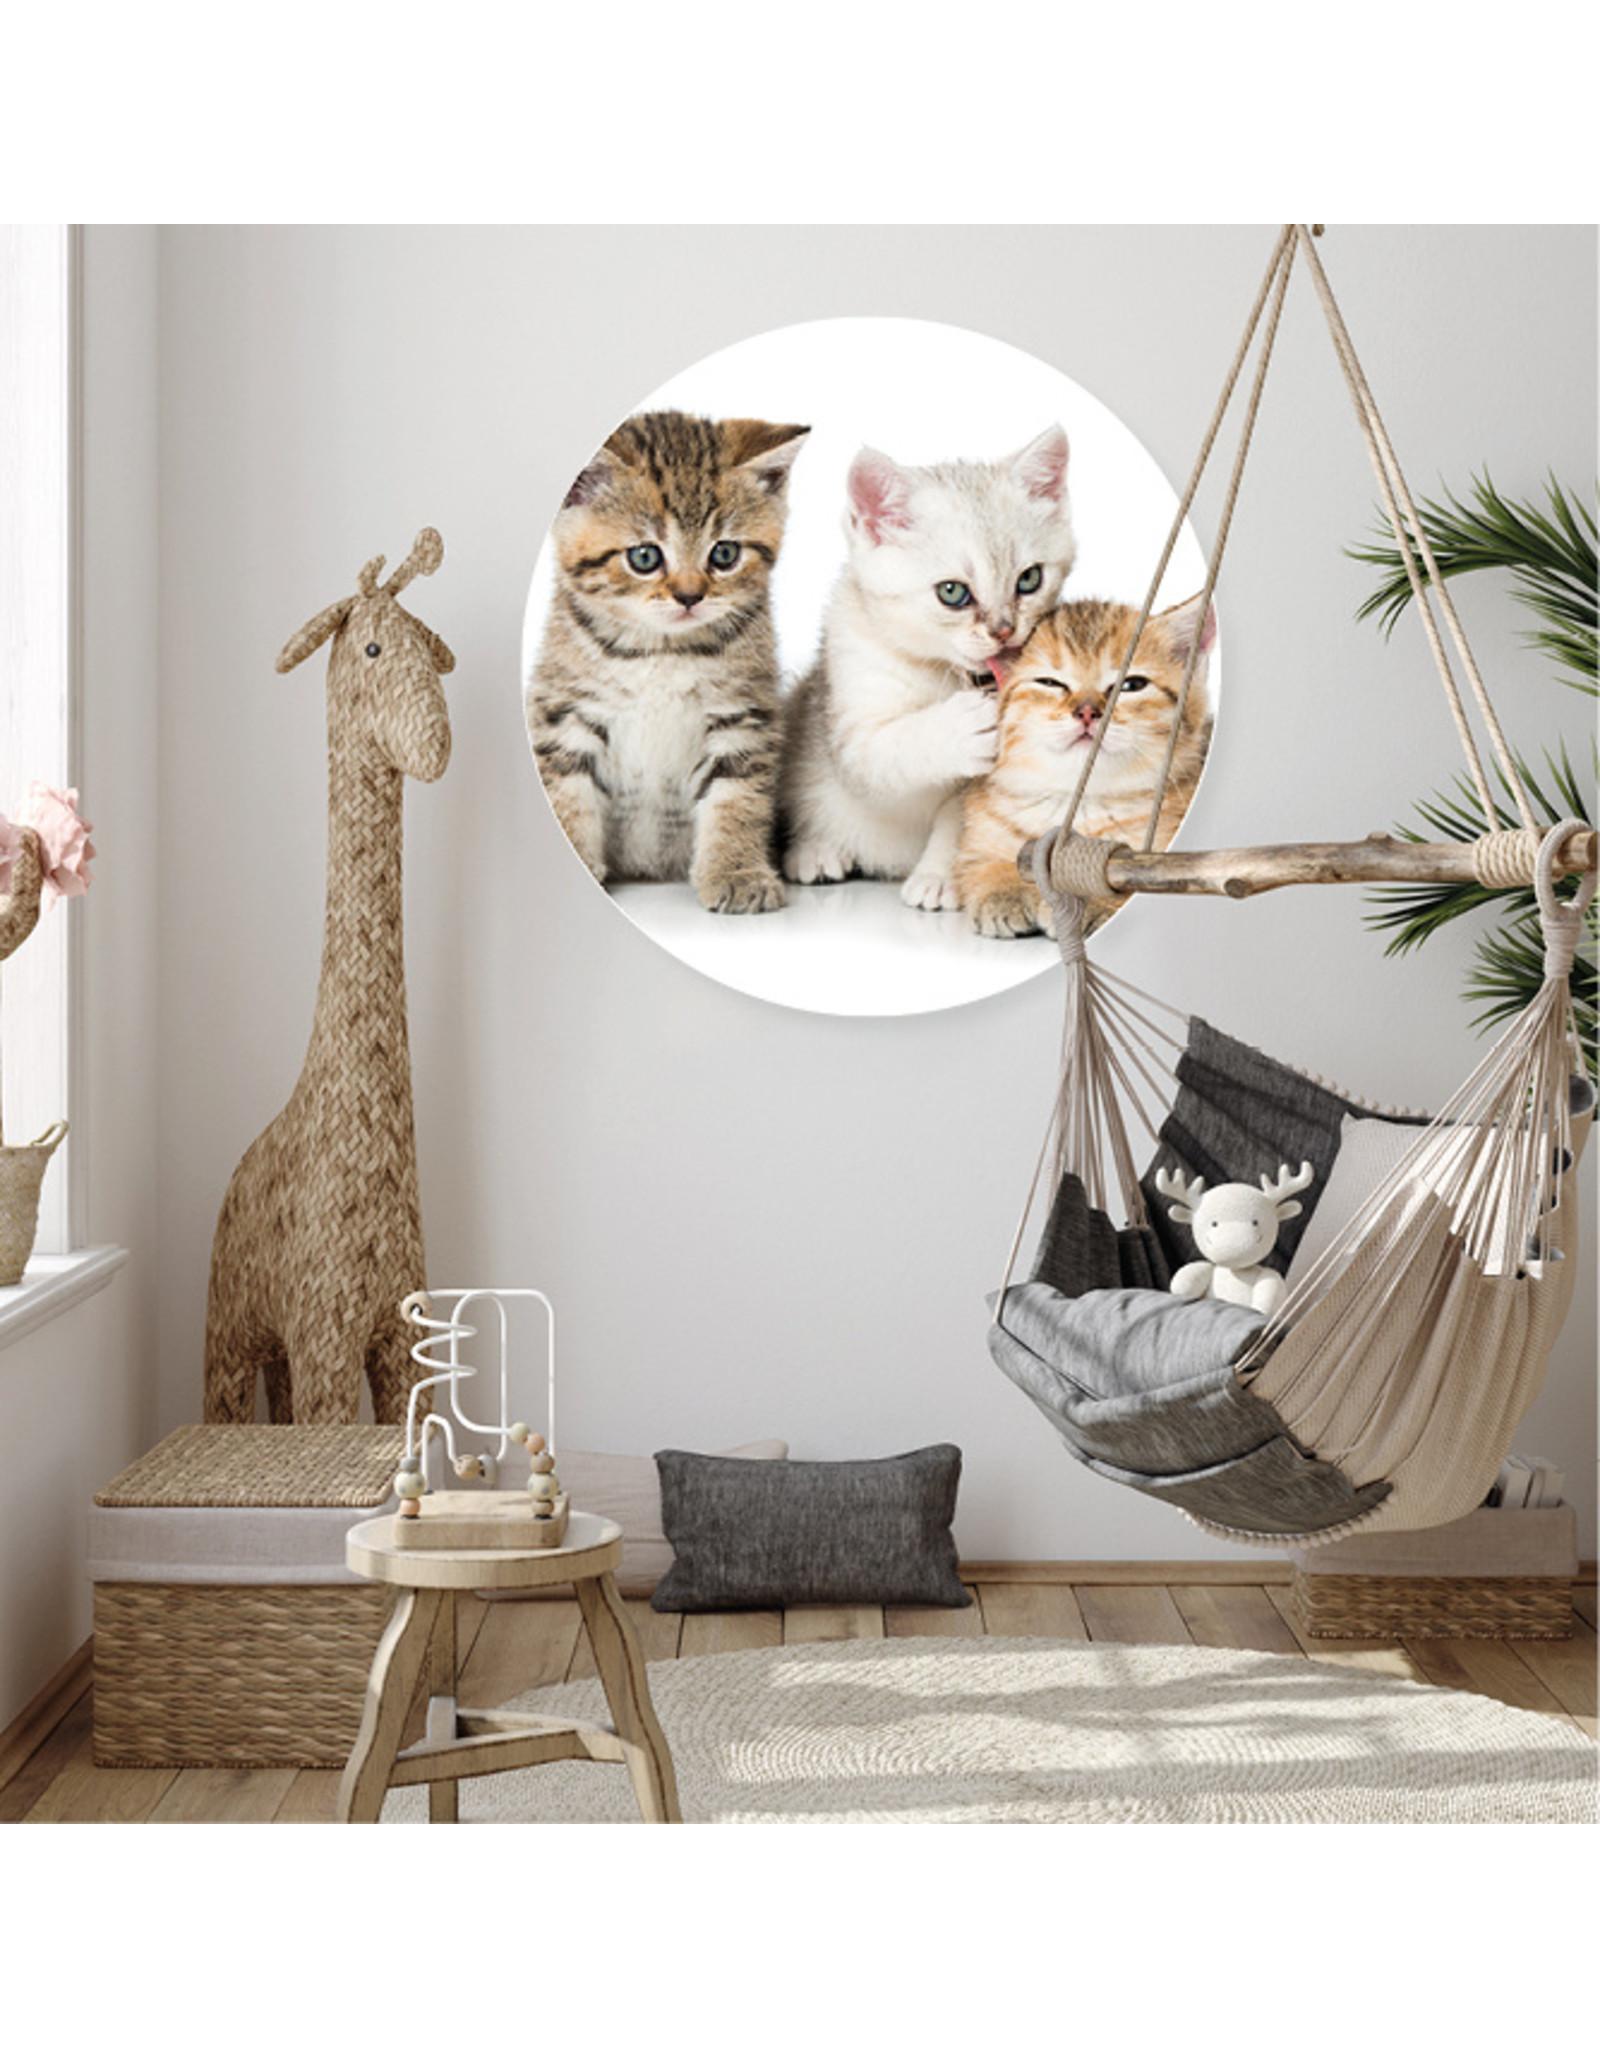 Dunnebier Home Muursticker Kittens - verwijderbaar